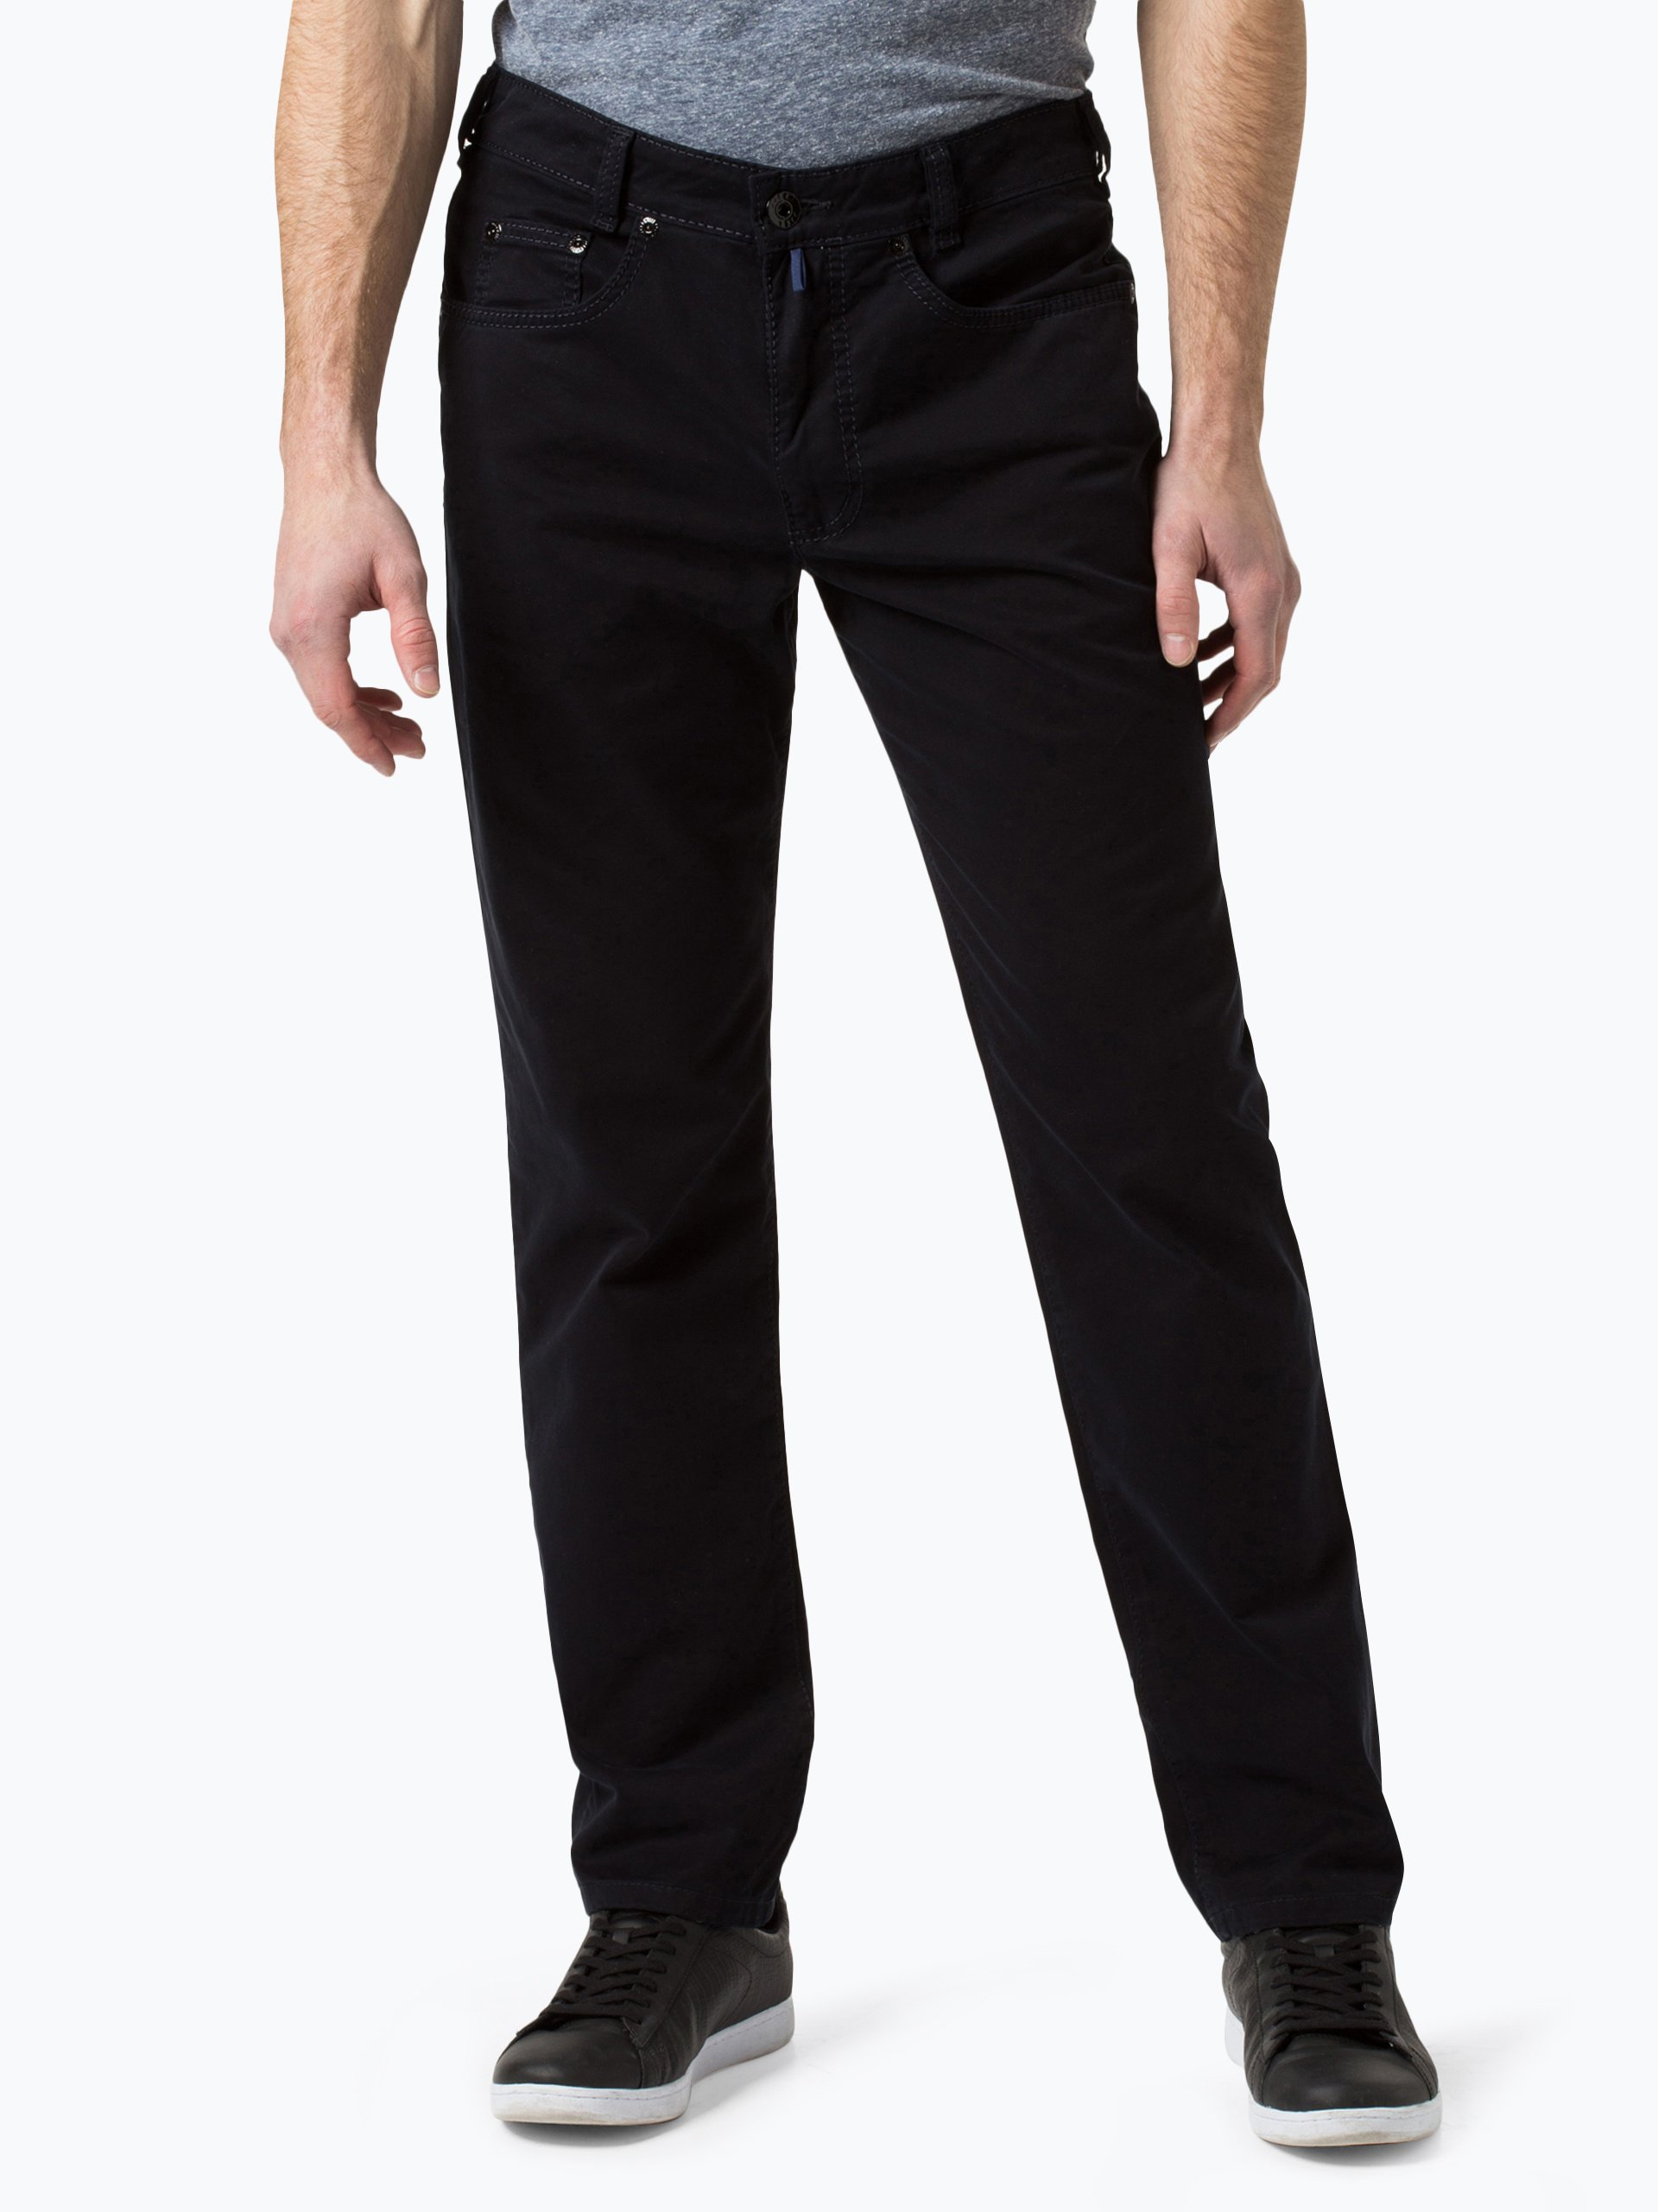 Joker Spodnie męskie – Harlem Walker